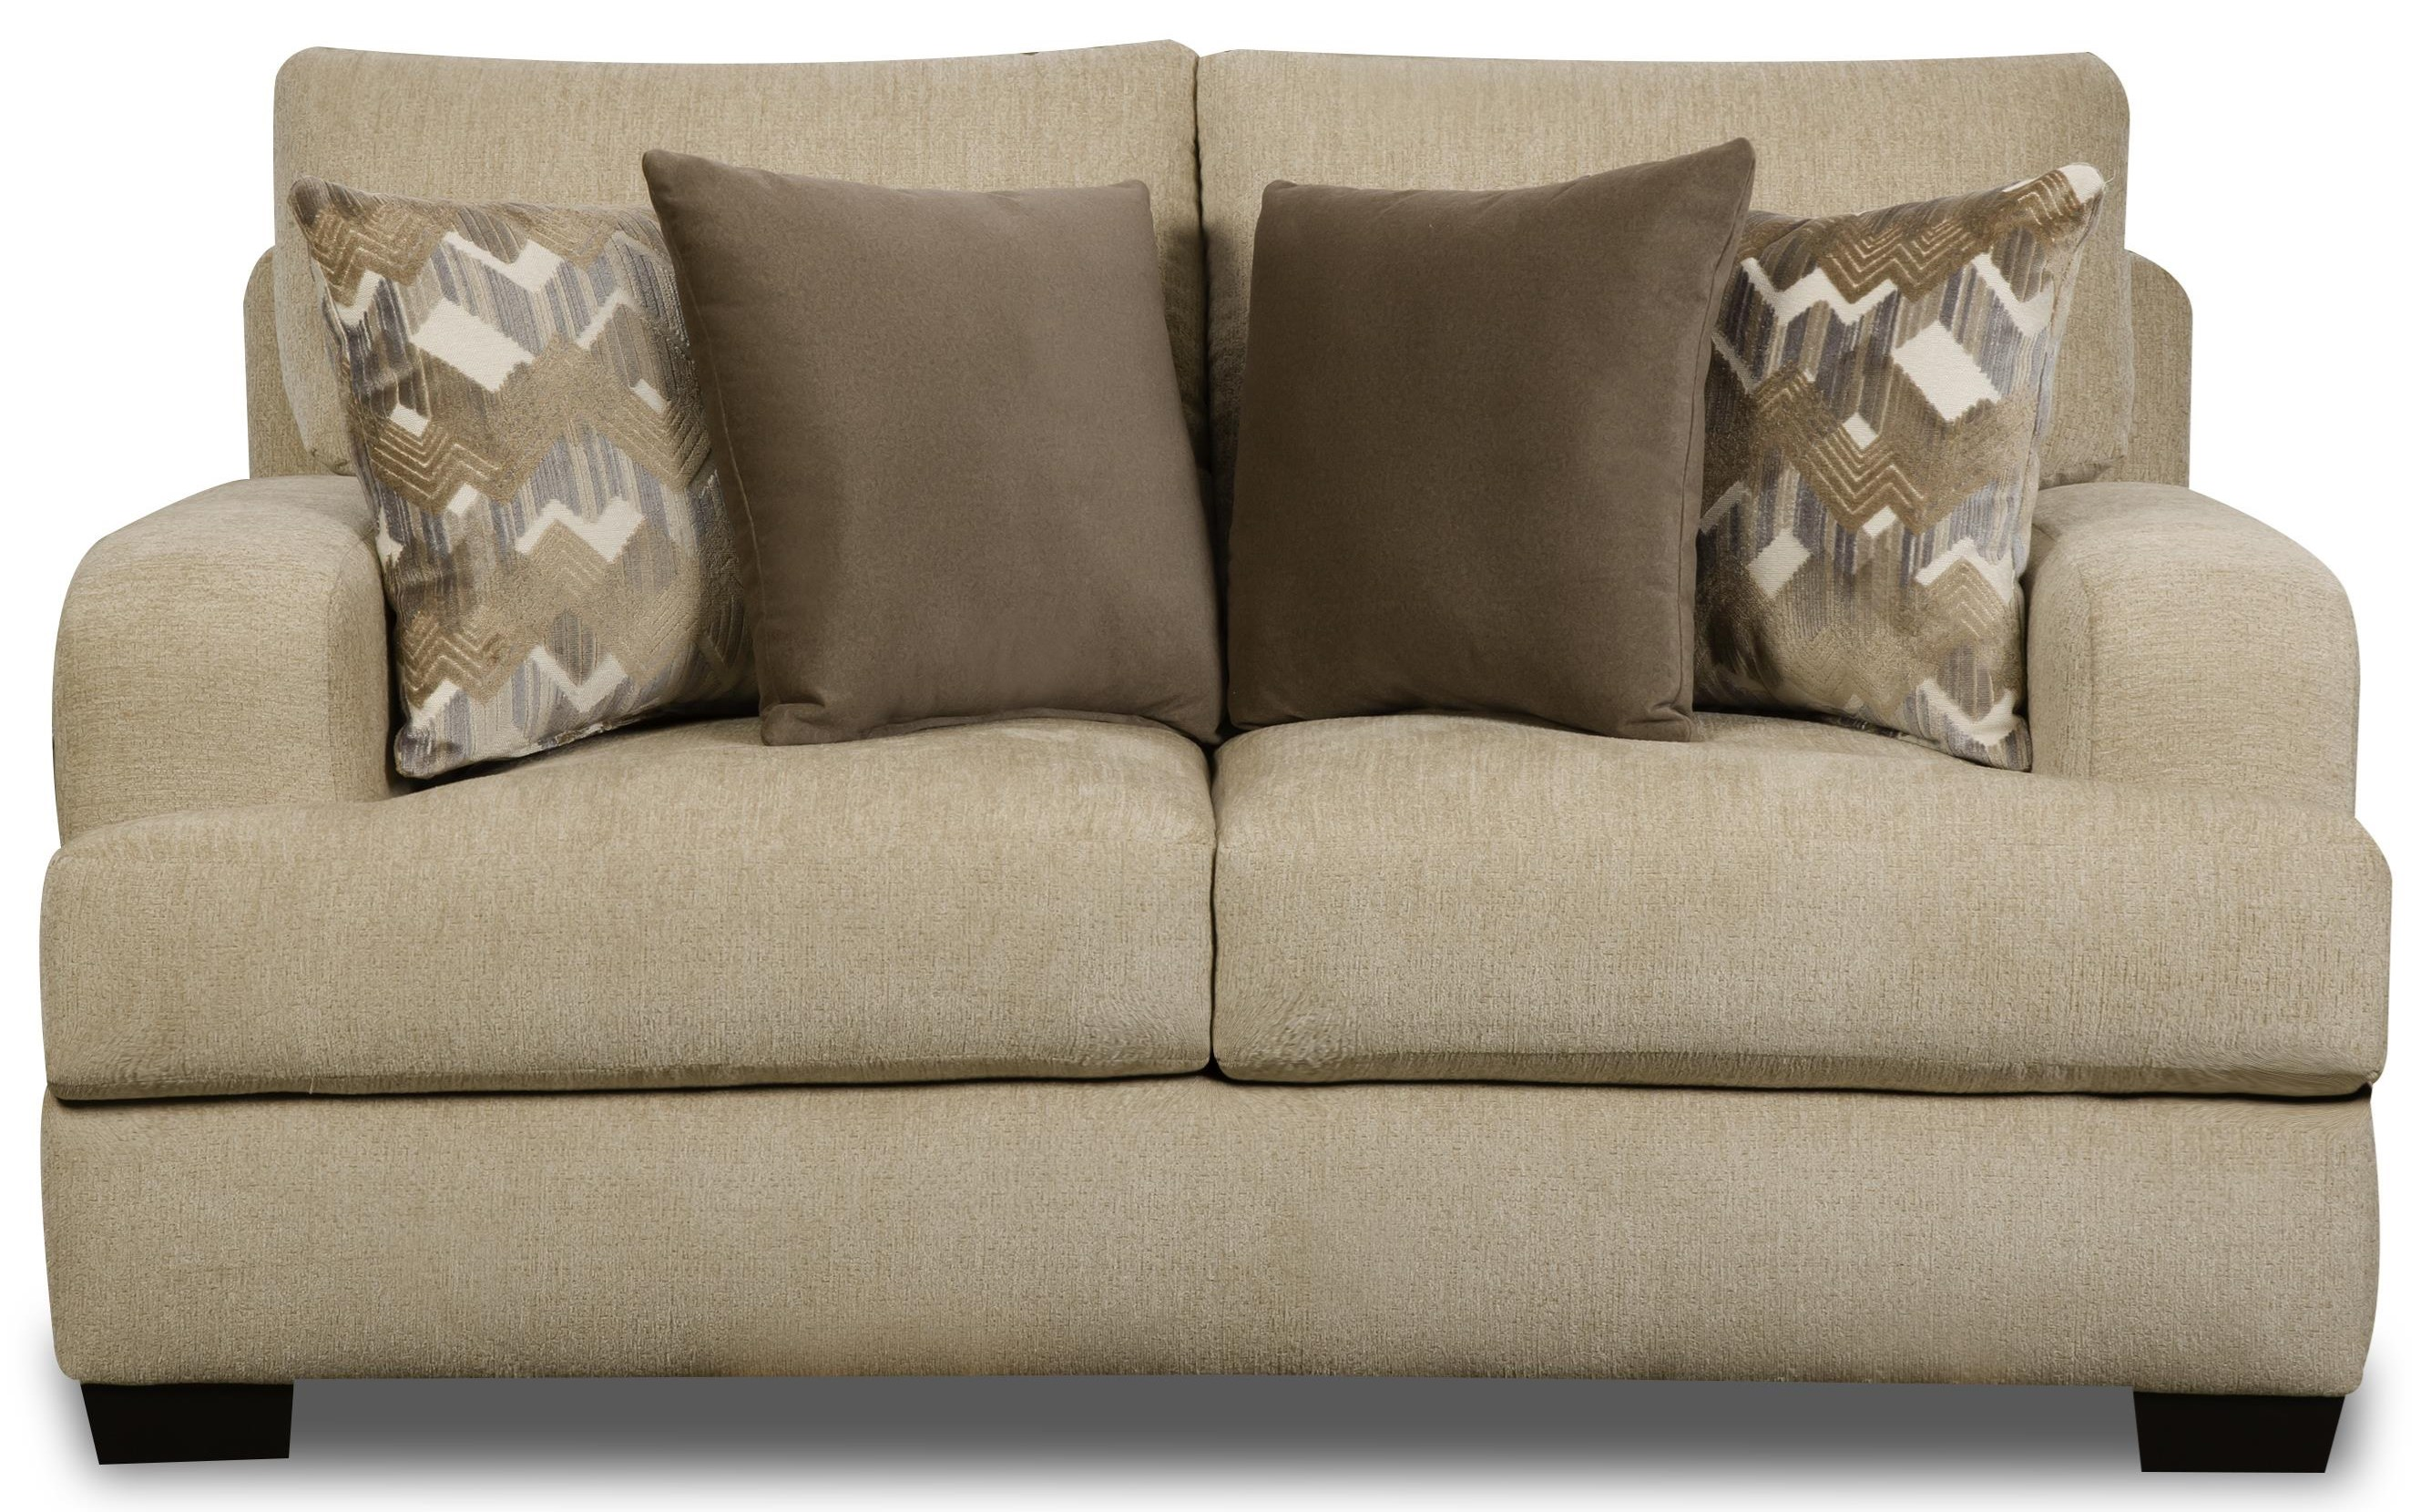 5200 Loveseat by Corinthian at Furniture Fair - North Carolina